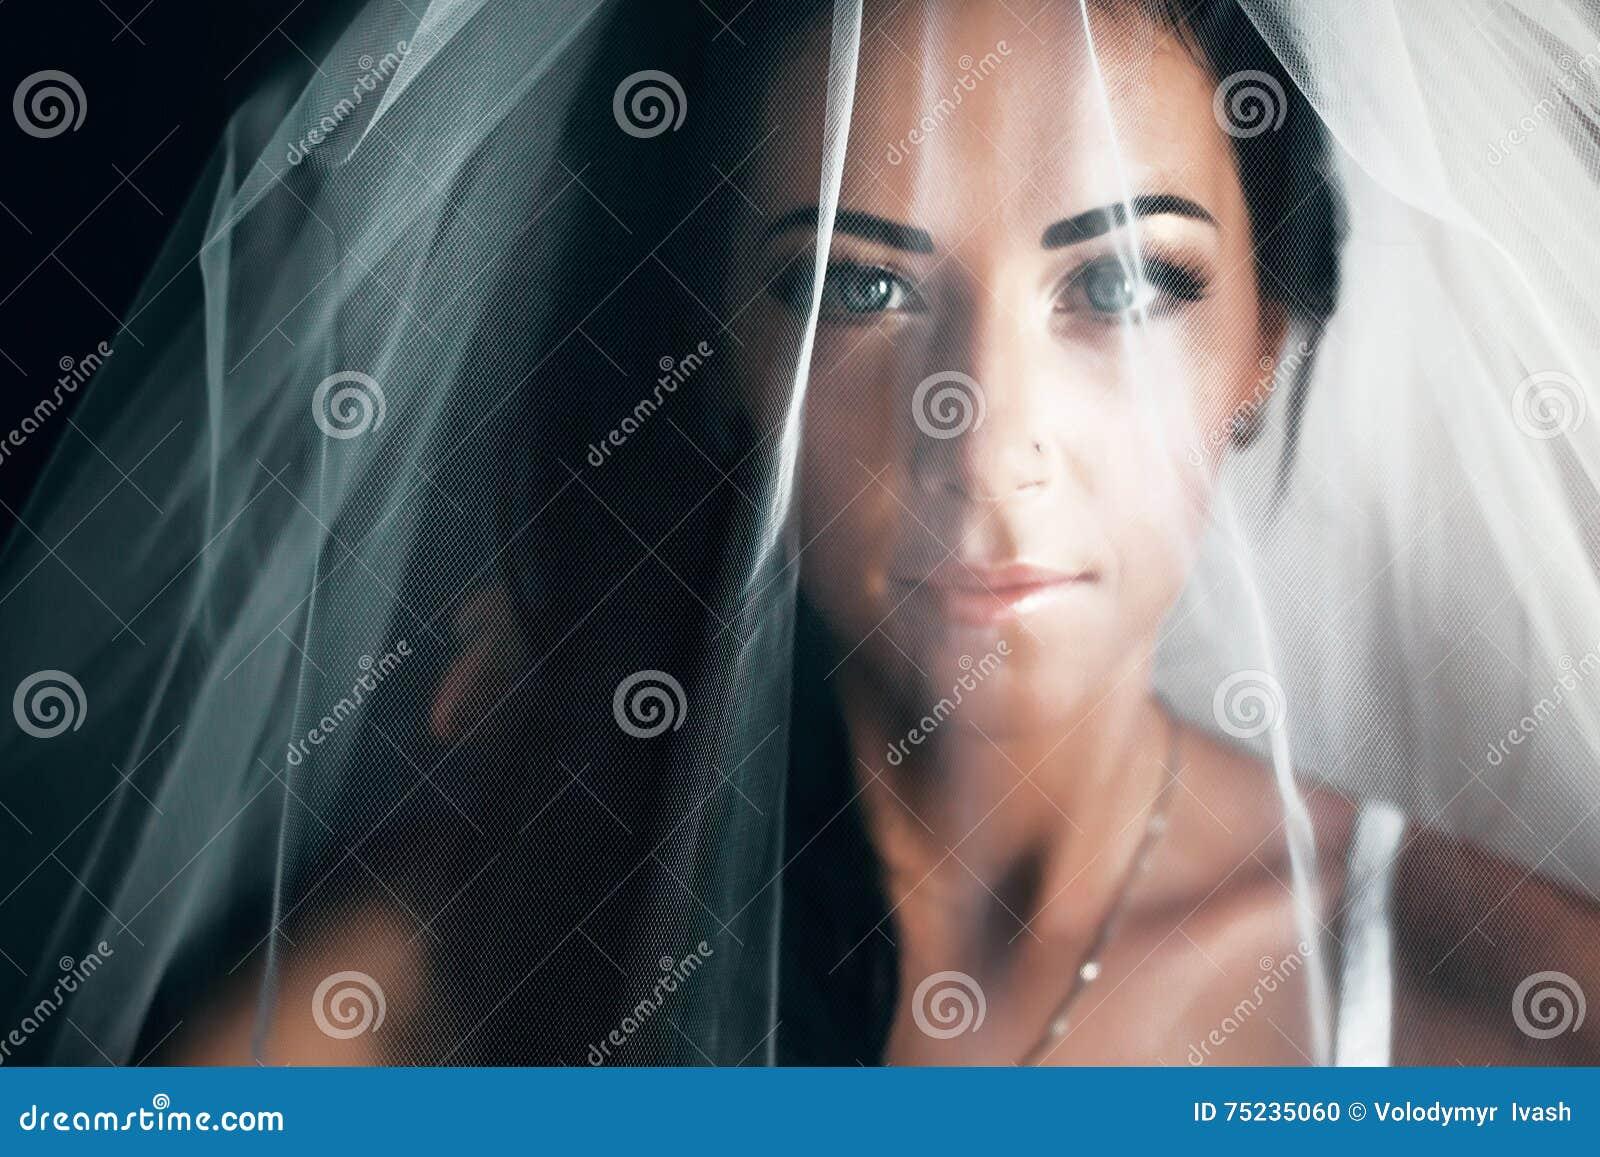 Stunning bride with black hair looks hidden under a veil